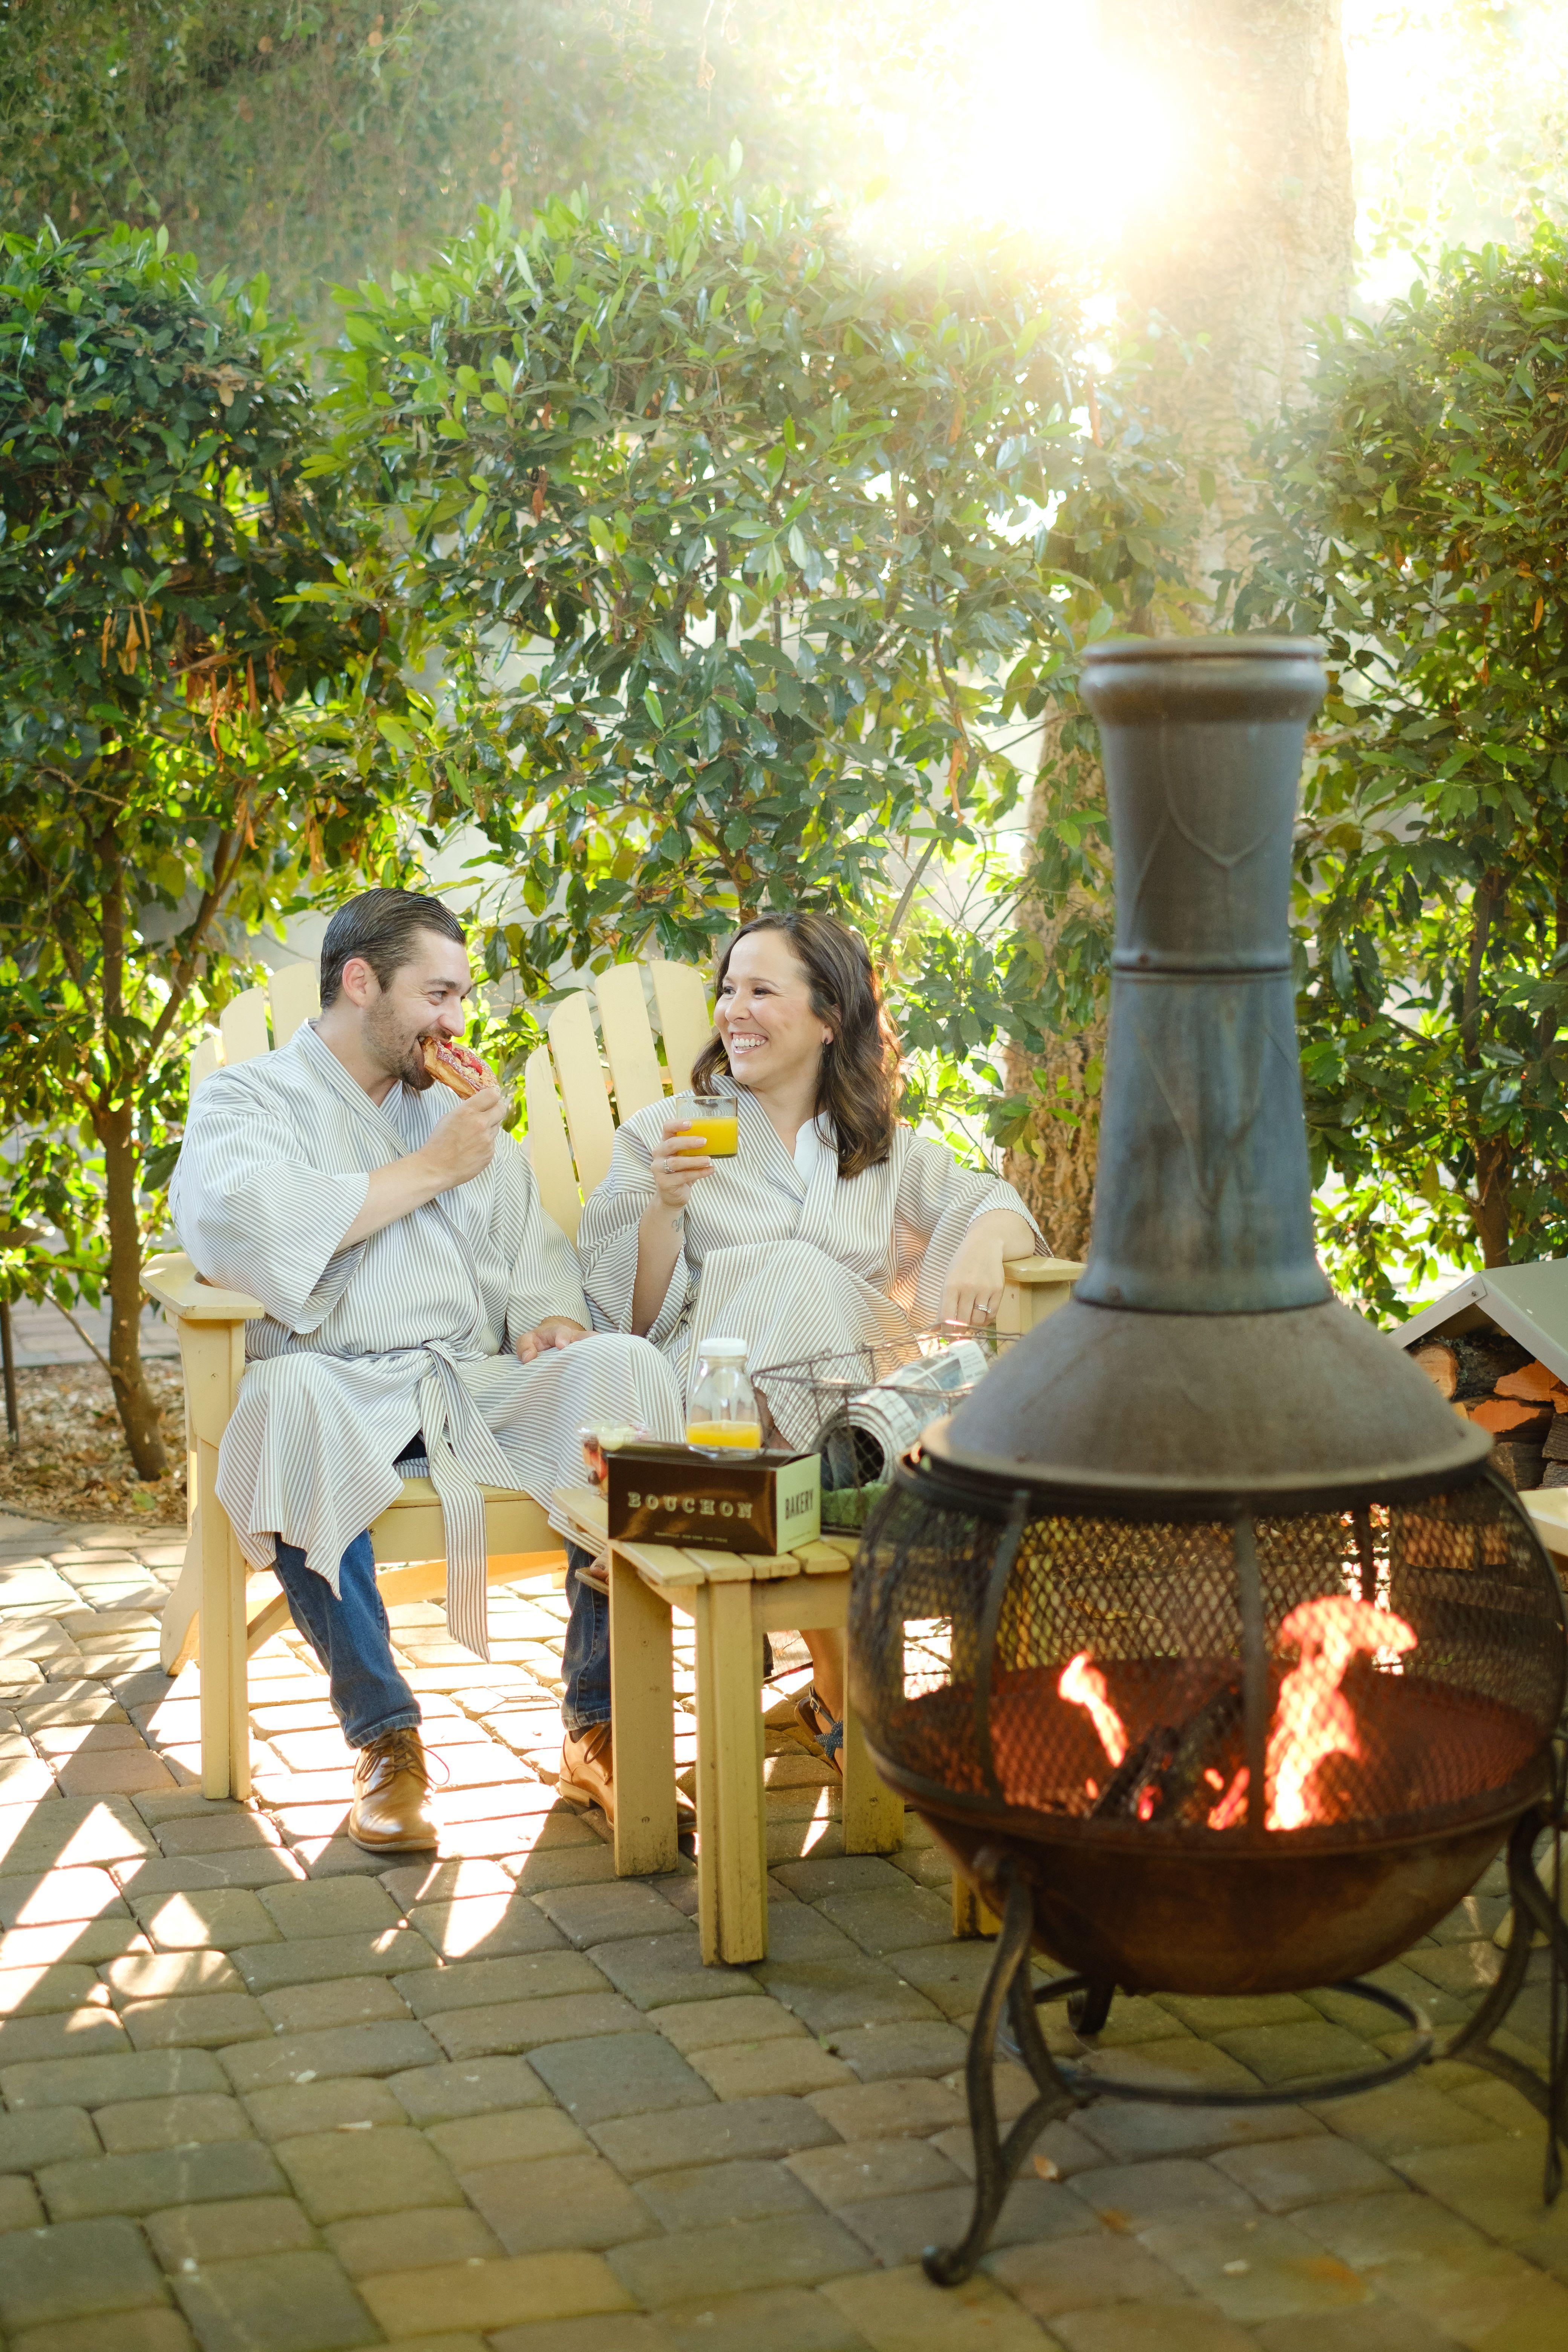 Every Cottage Has A Private Garden With Chimenea Napa Valley Honeymoon Best Weekend Getaways Yountville Restaurants